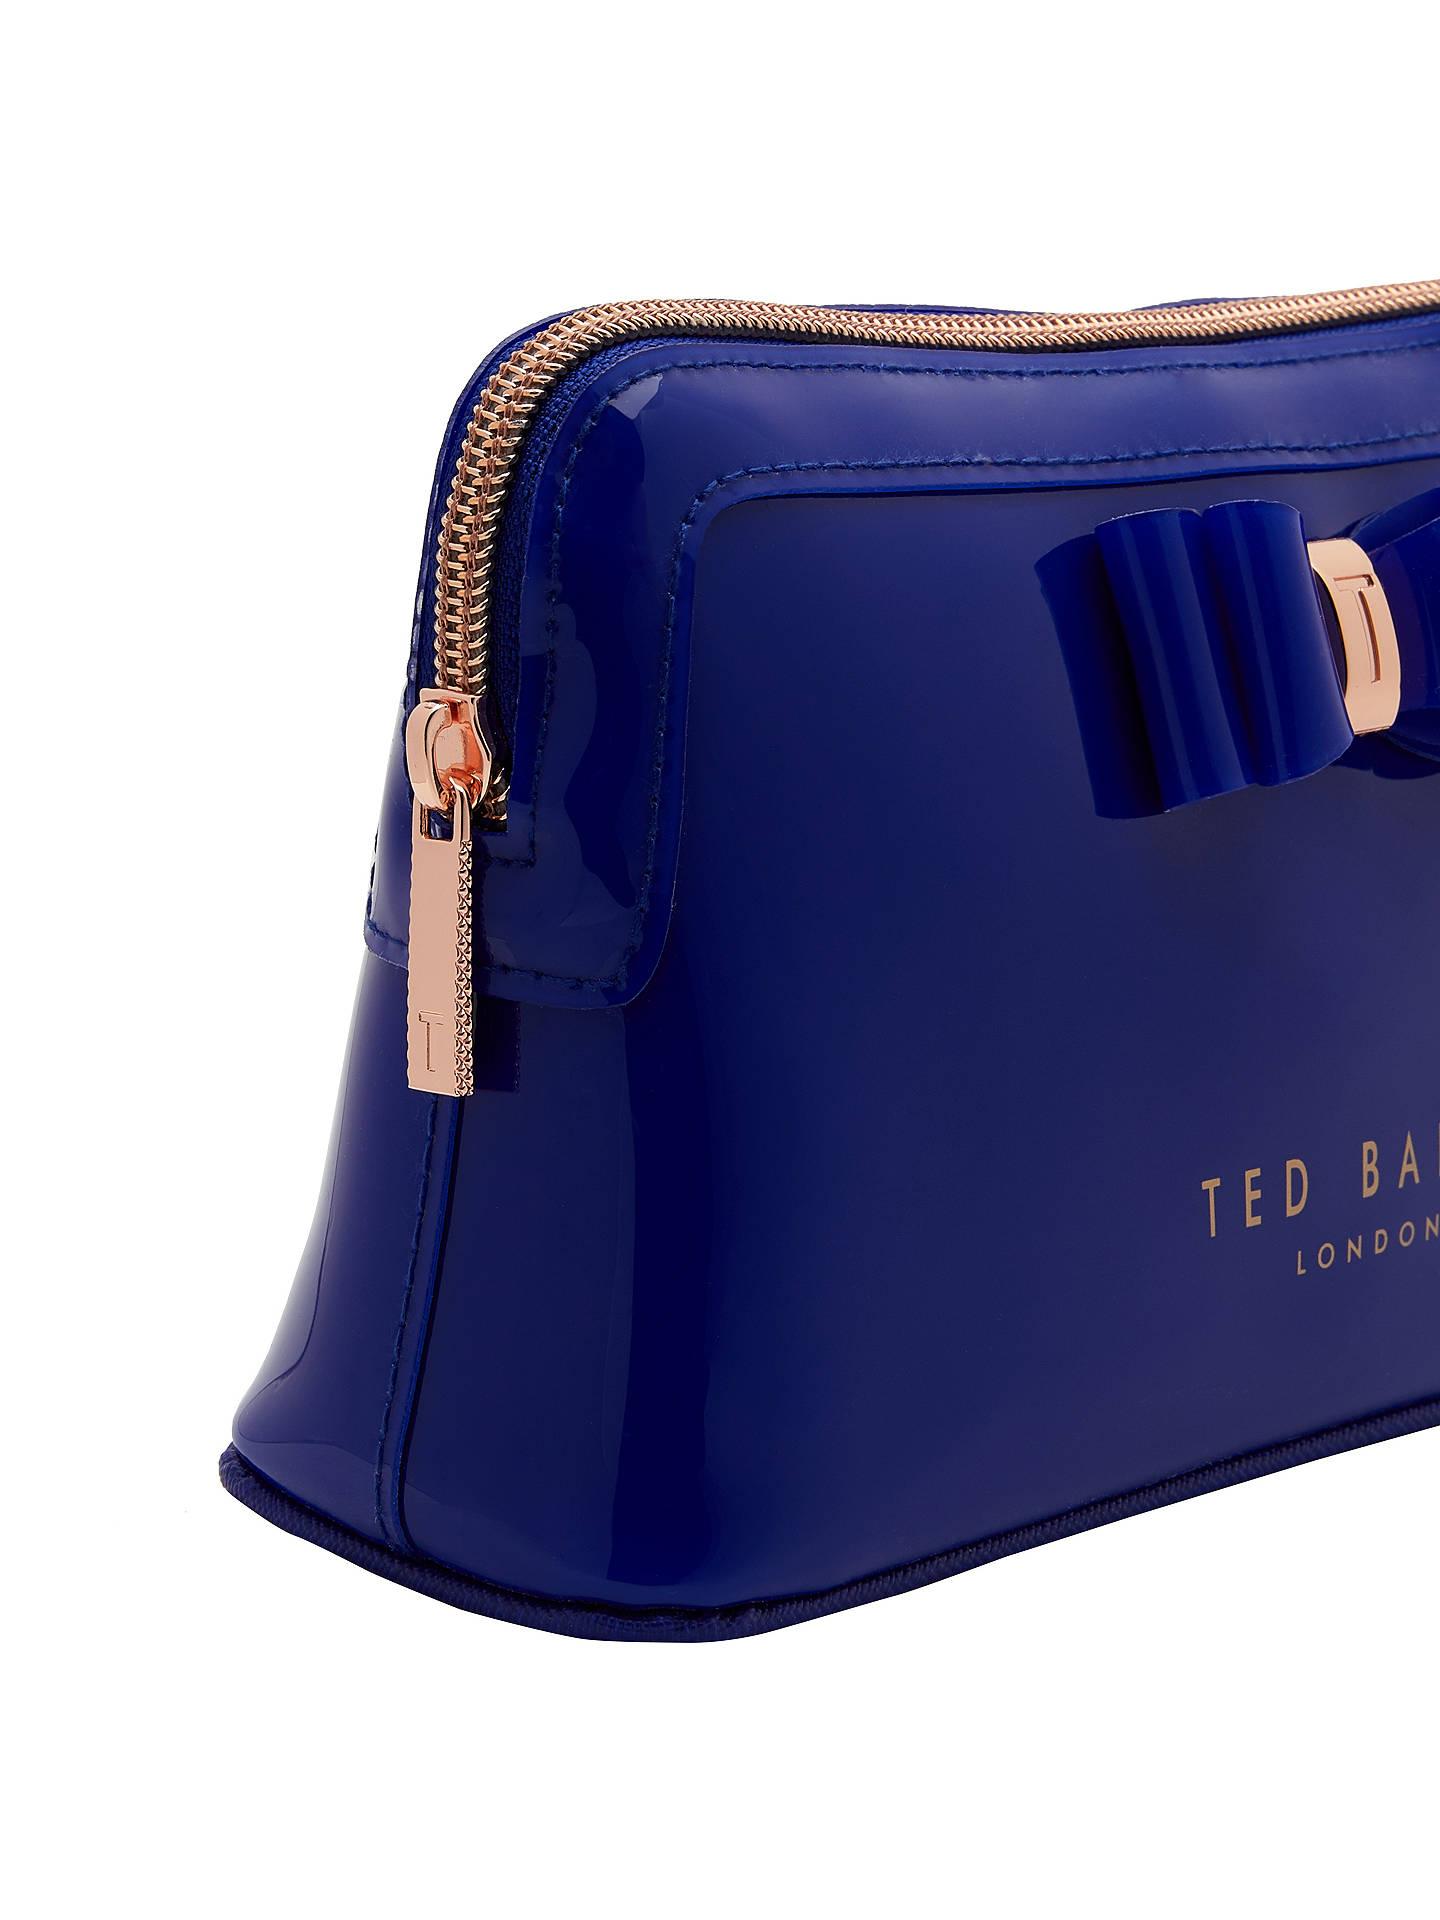 9dfd6937b0a ... Buy Ted Baker Julis Bow Makeup Bag, Bright Blue Online at johnlewis.com